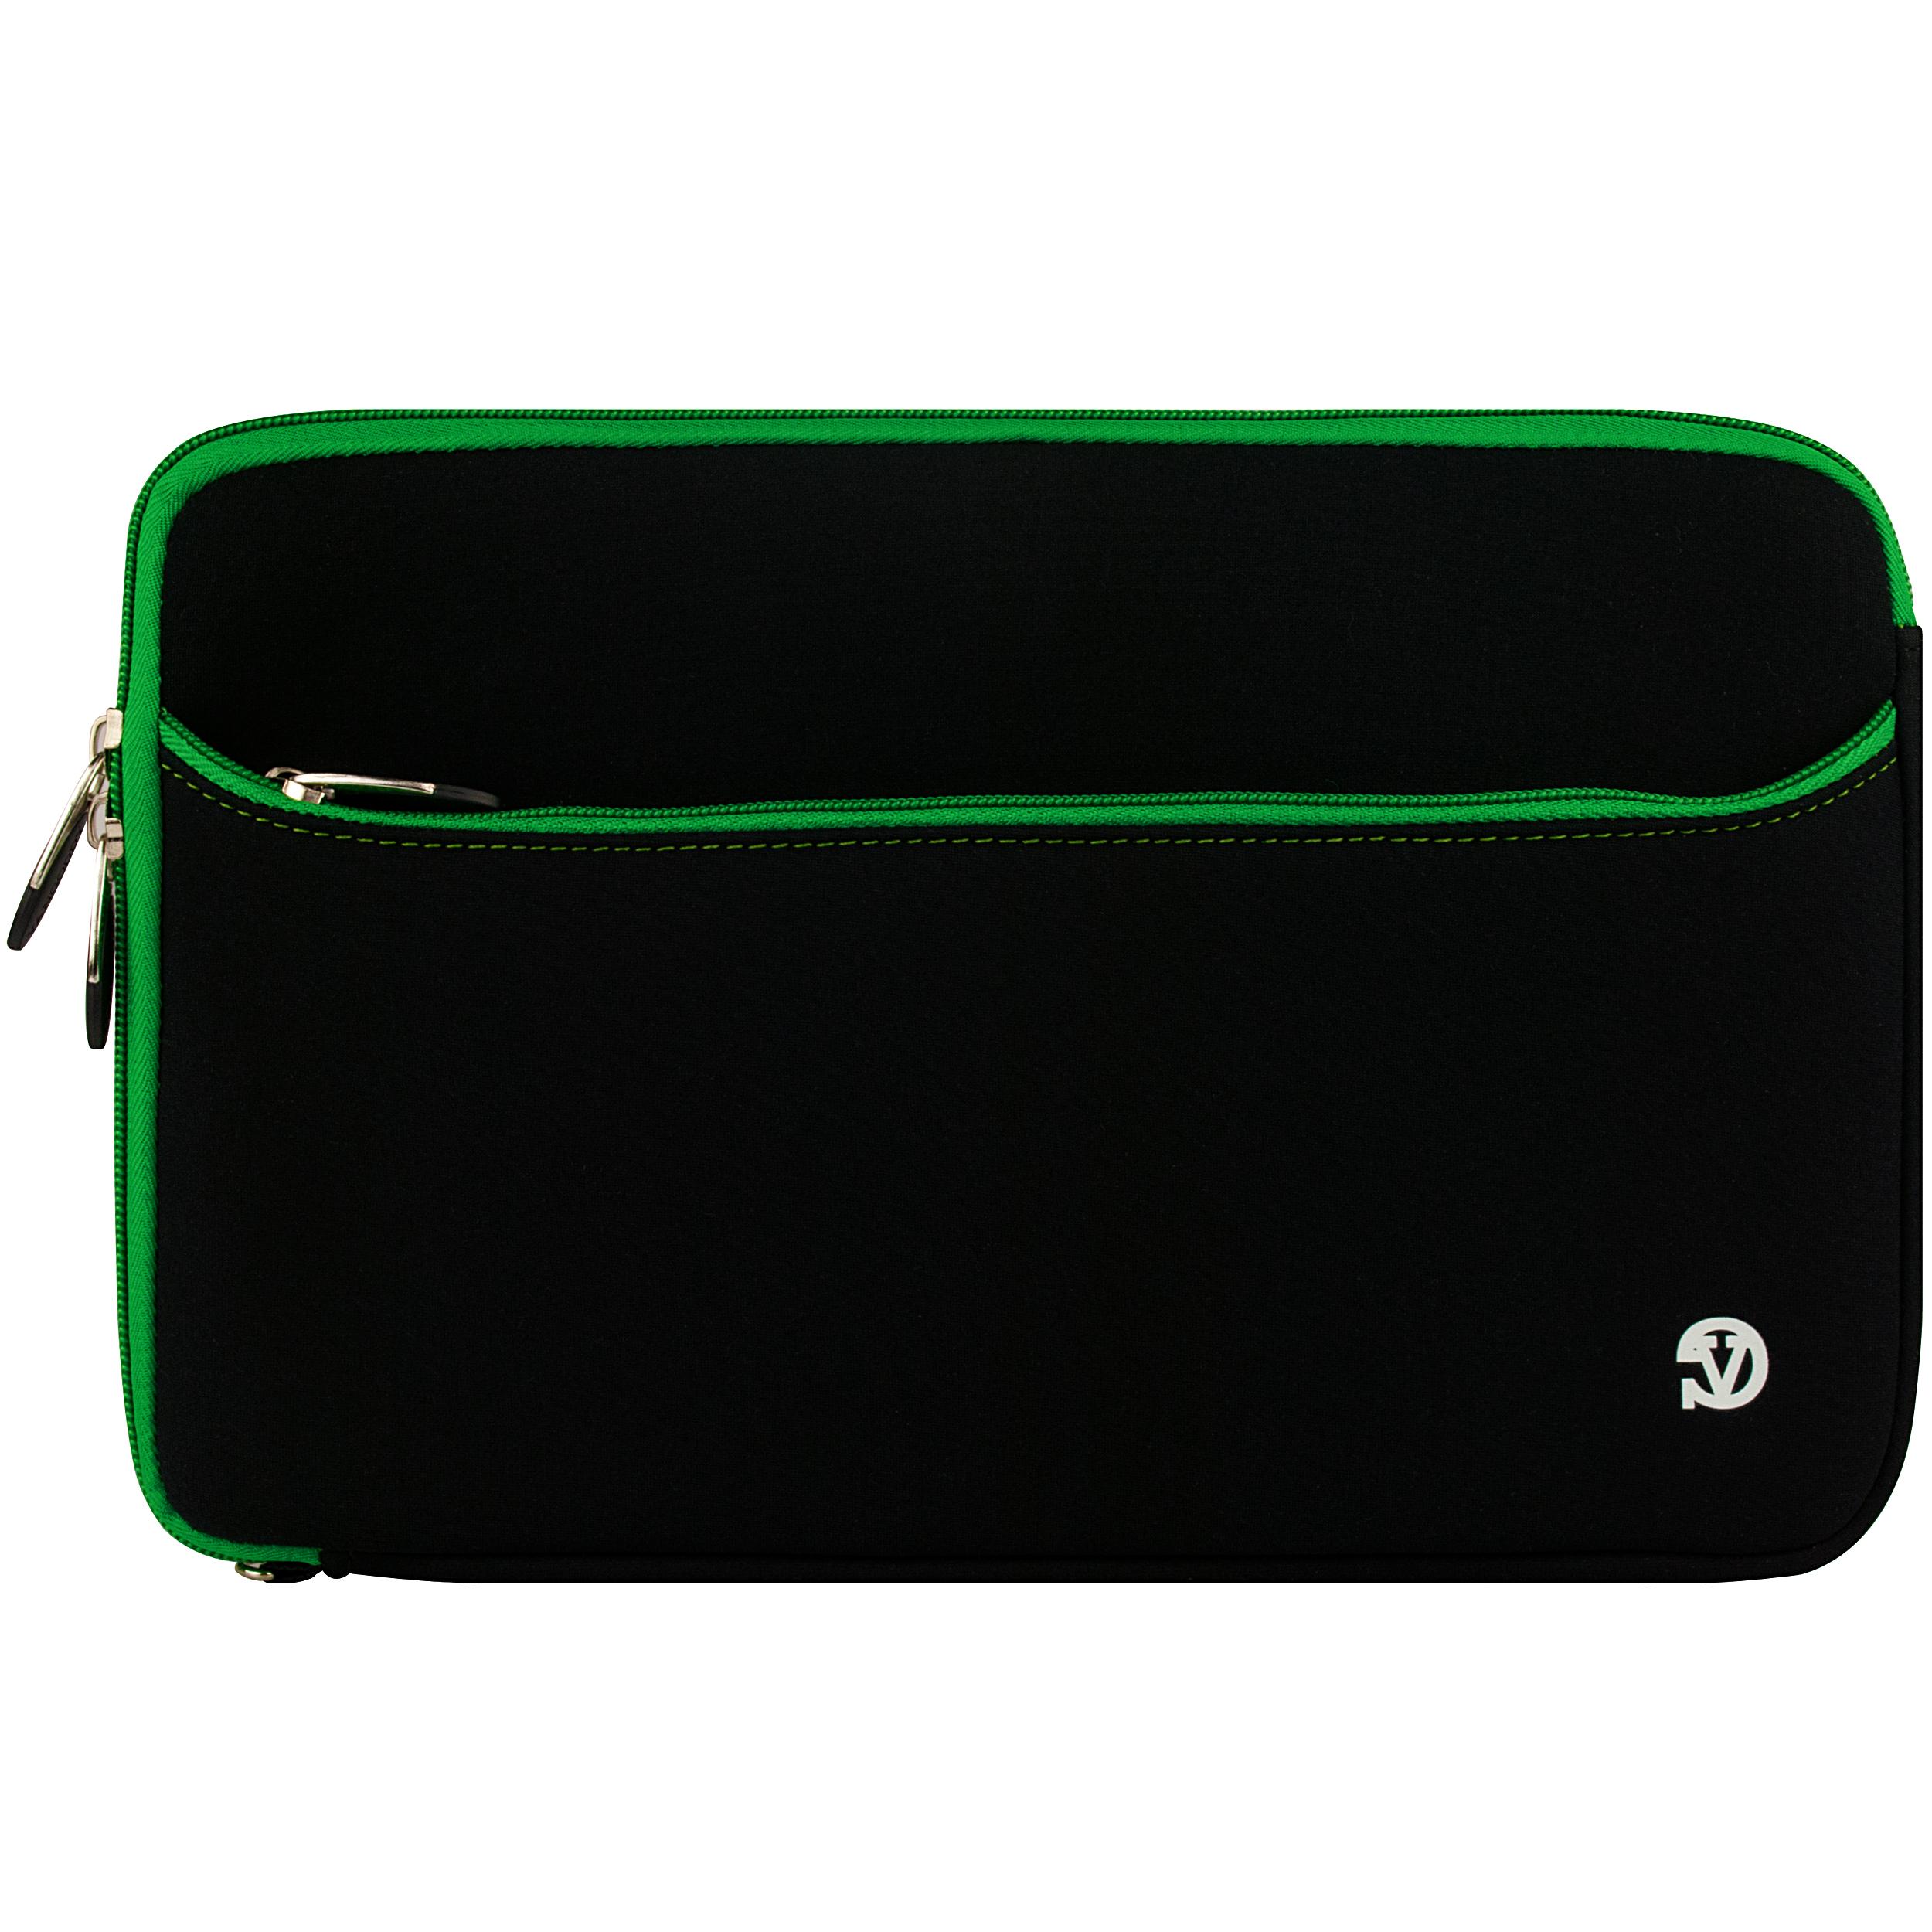 Neoprene 10.1 Sleeve (Black/Green Trim)